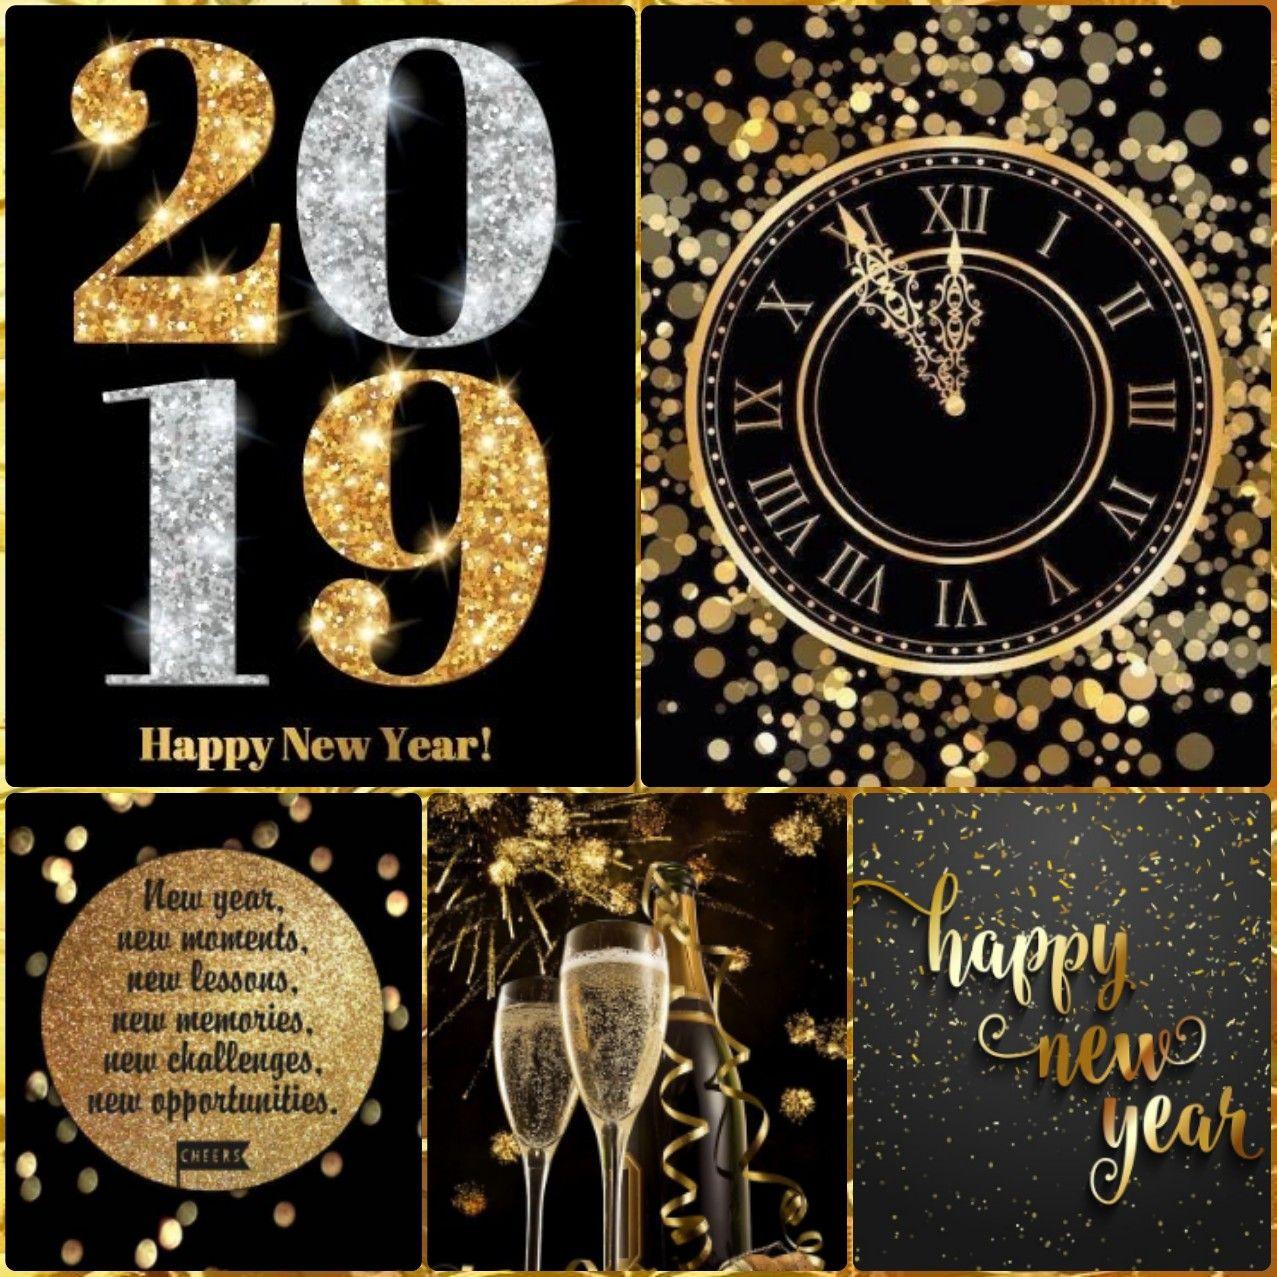 Happy new year Happy new year gif, New year wishes